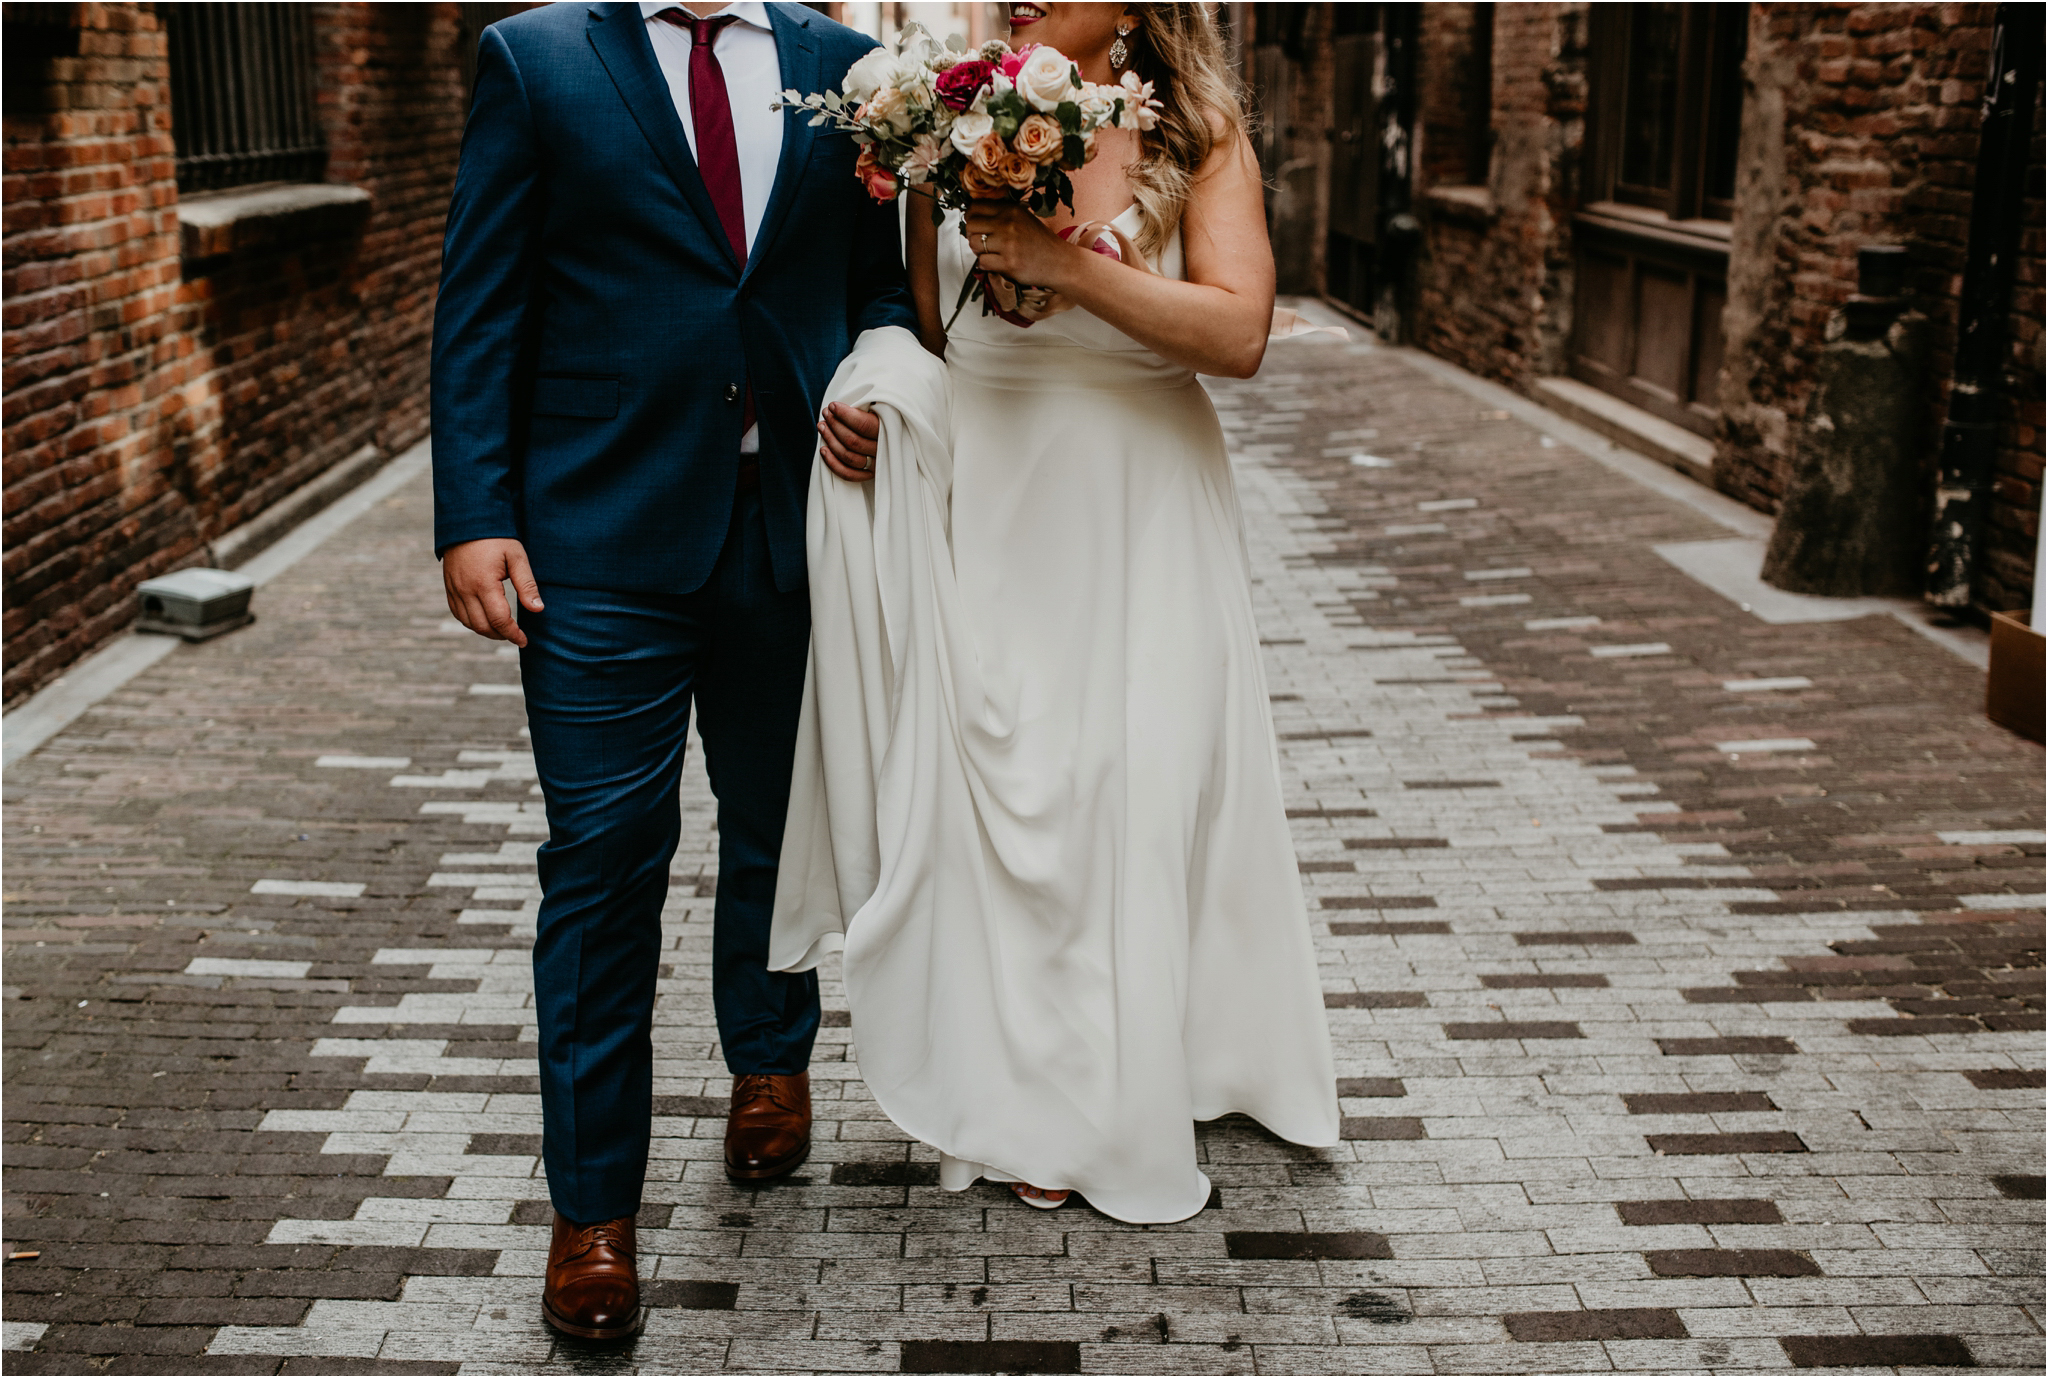 laura-and-matt-metropolist-urban-seattle-wedding-photographer-078.jpg